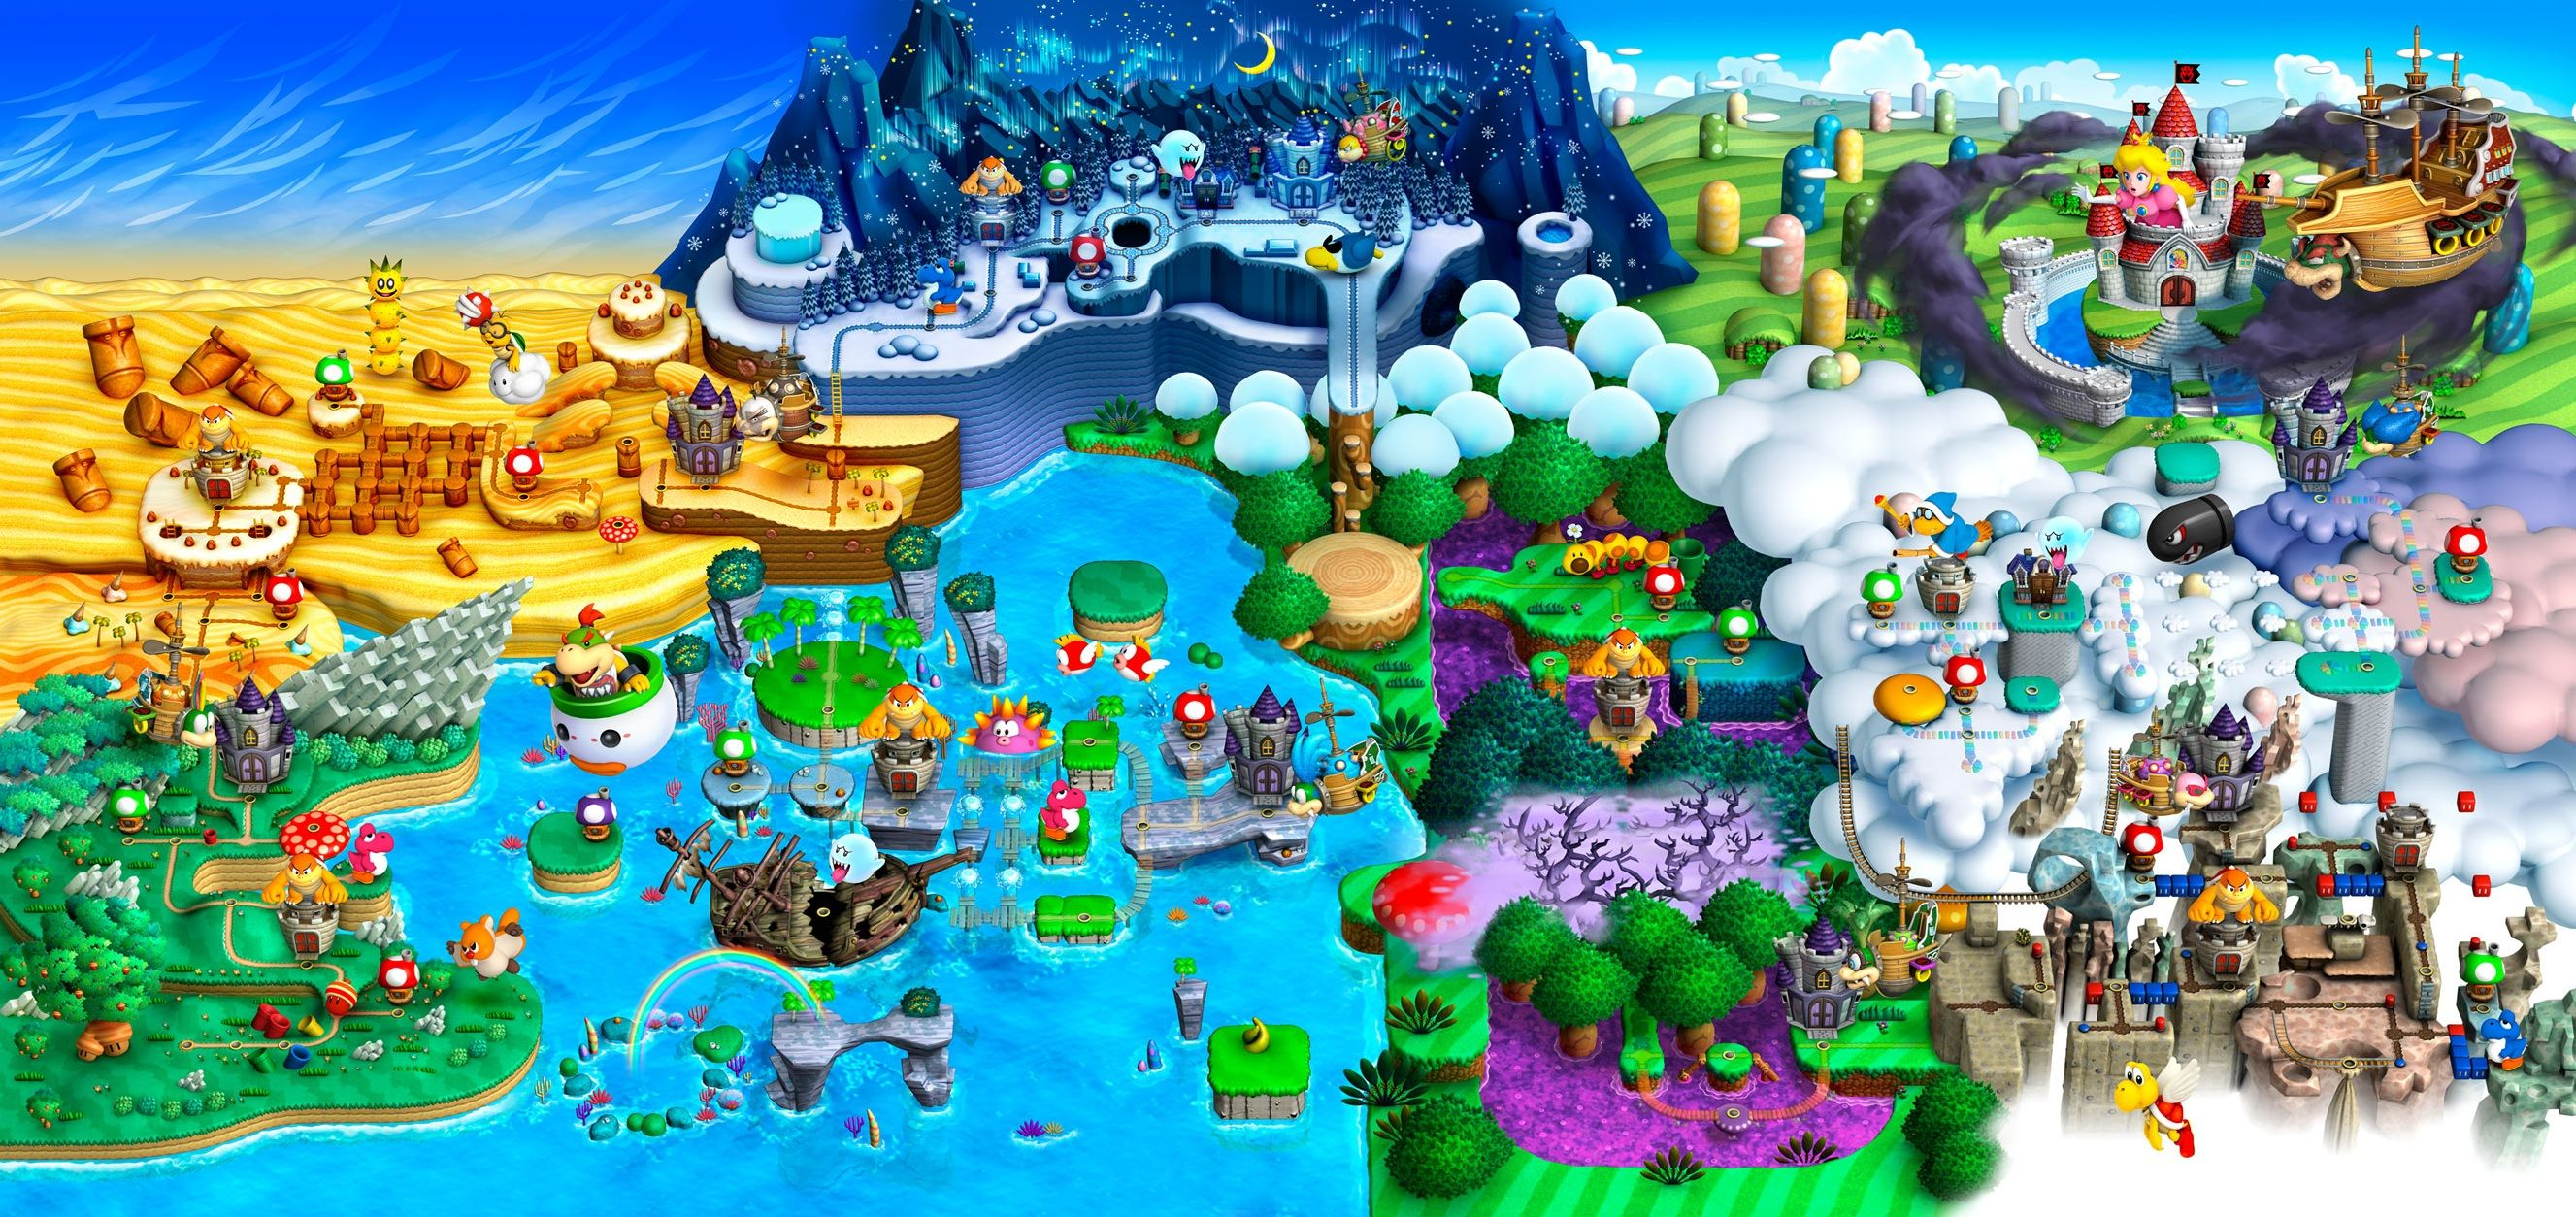 New Super Mario Bros Wii U   Super Mario   Super mario world